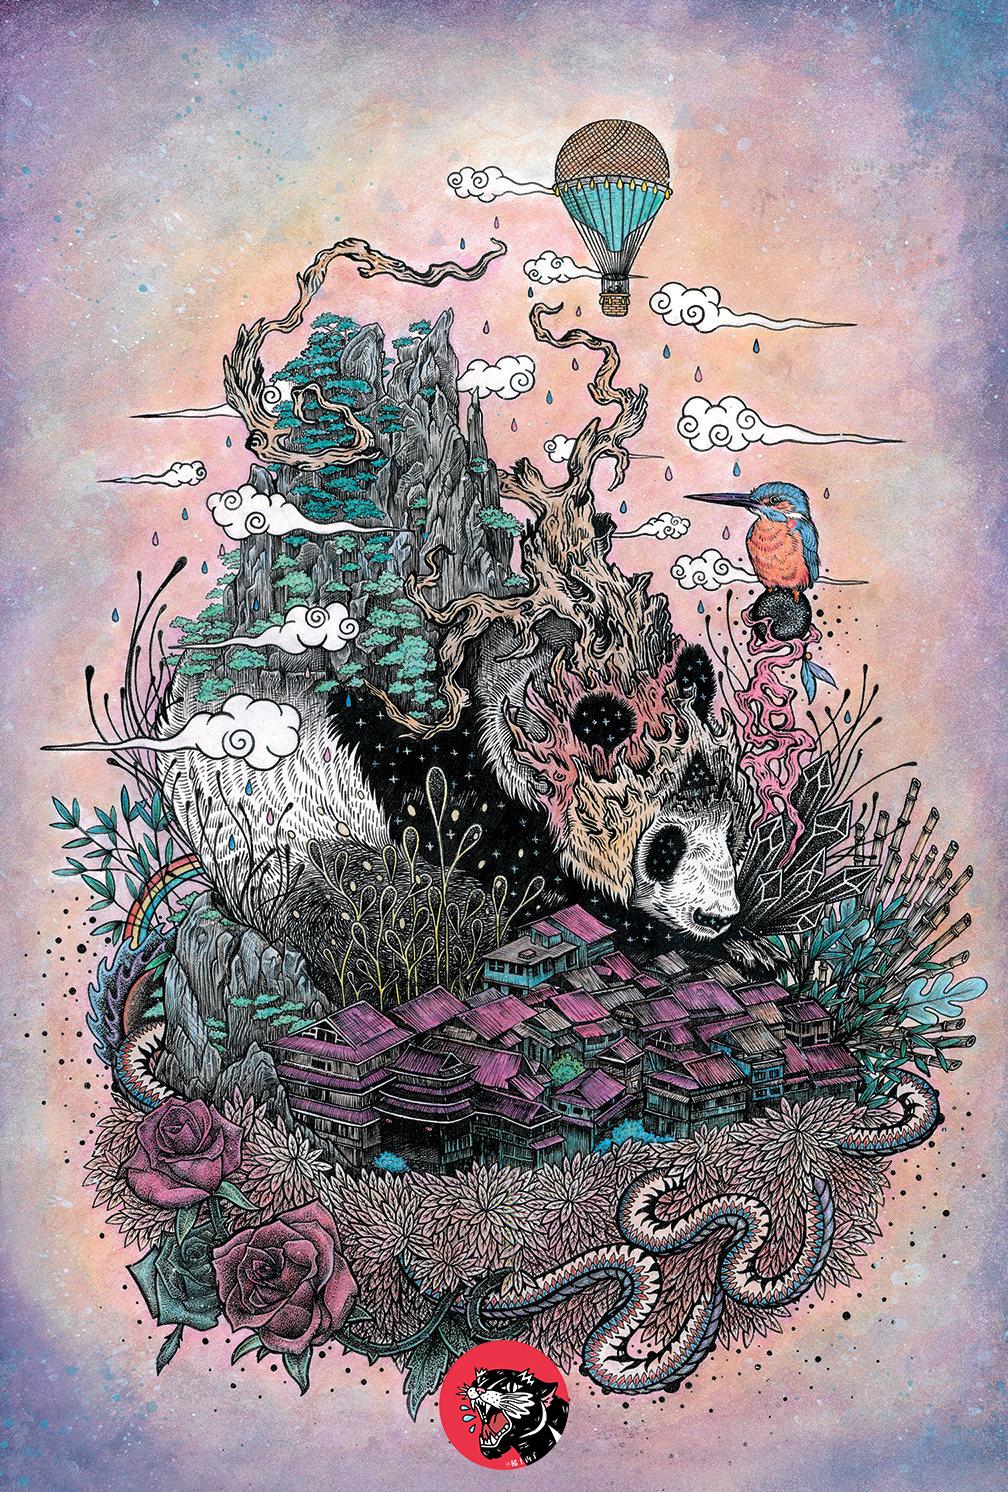 手绘山海经--灵兽插画 图形设计 手绘illustration graphic design